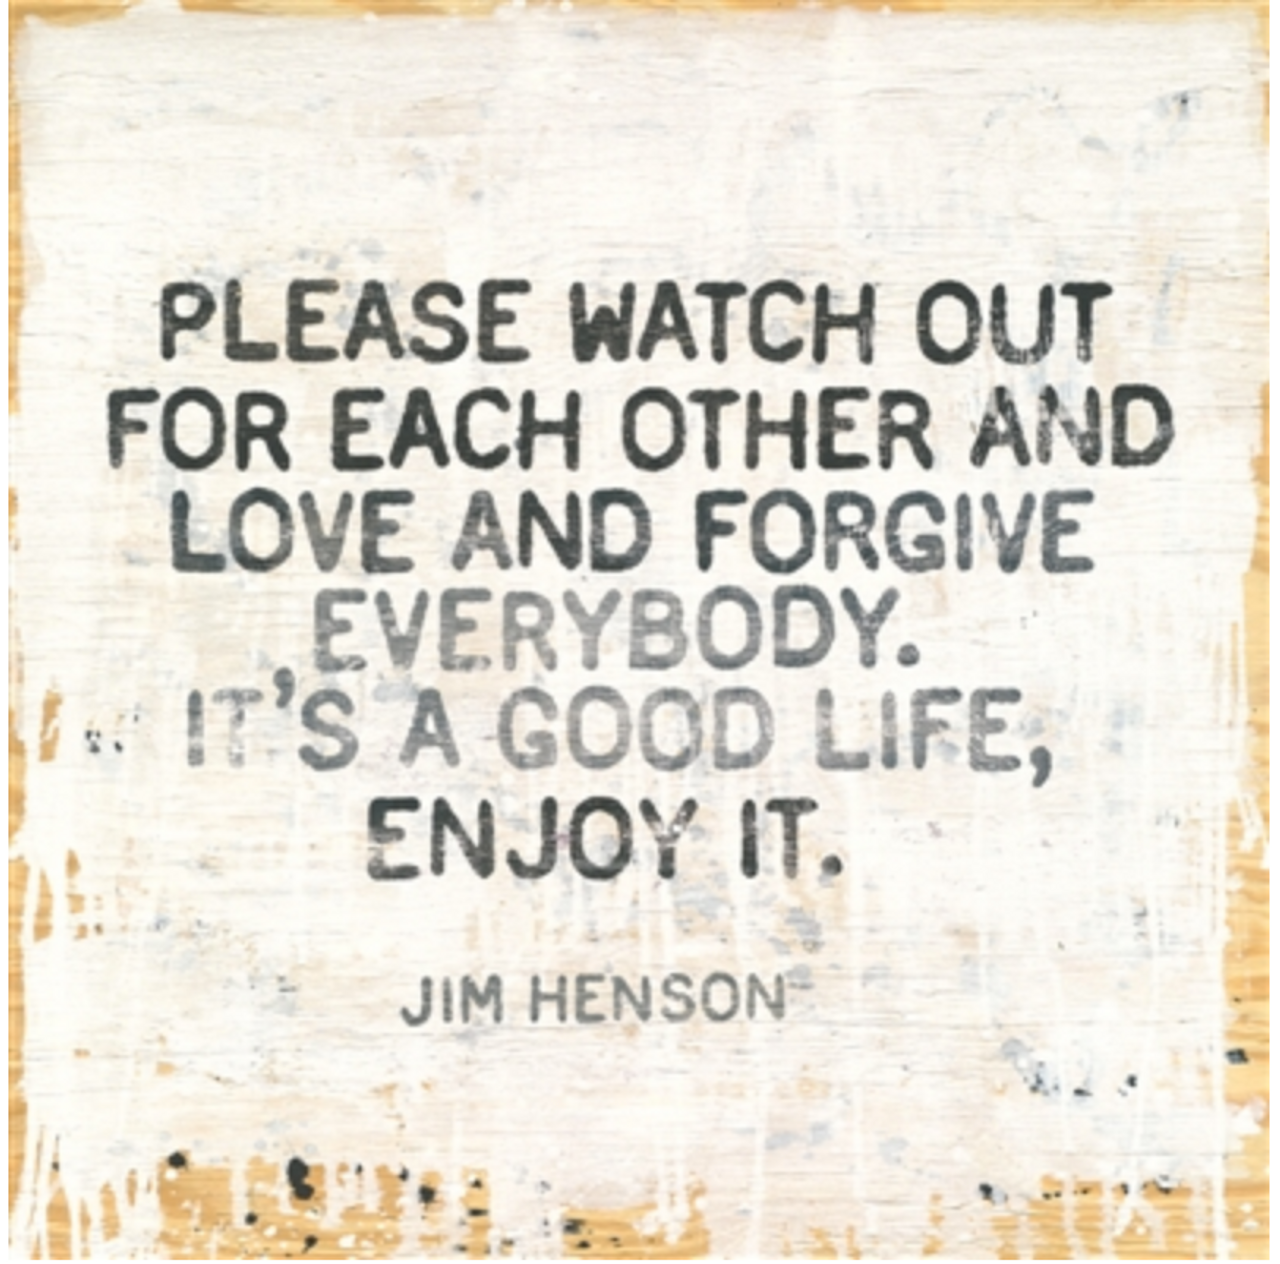 jim henson art print with gallery wrap frame